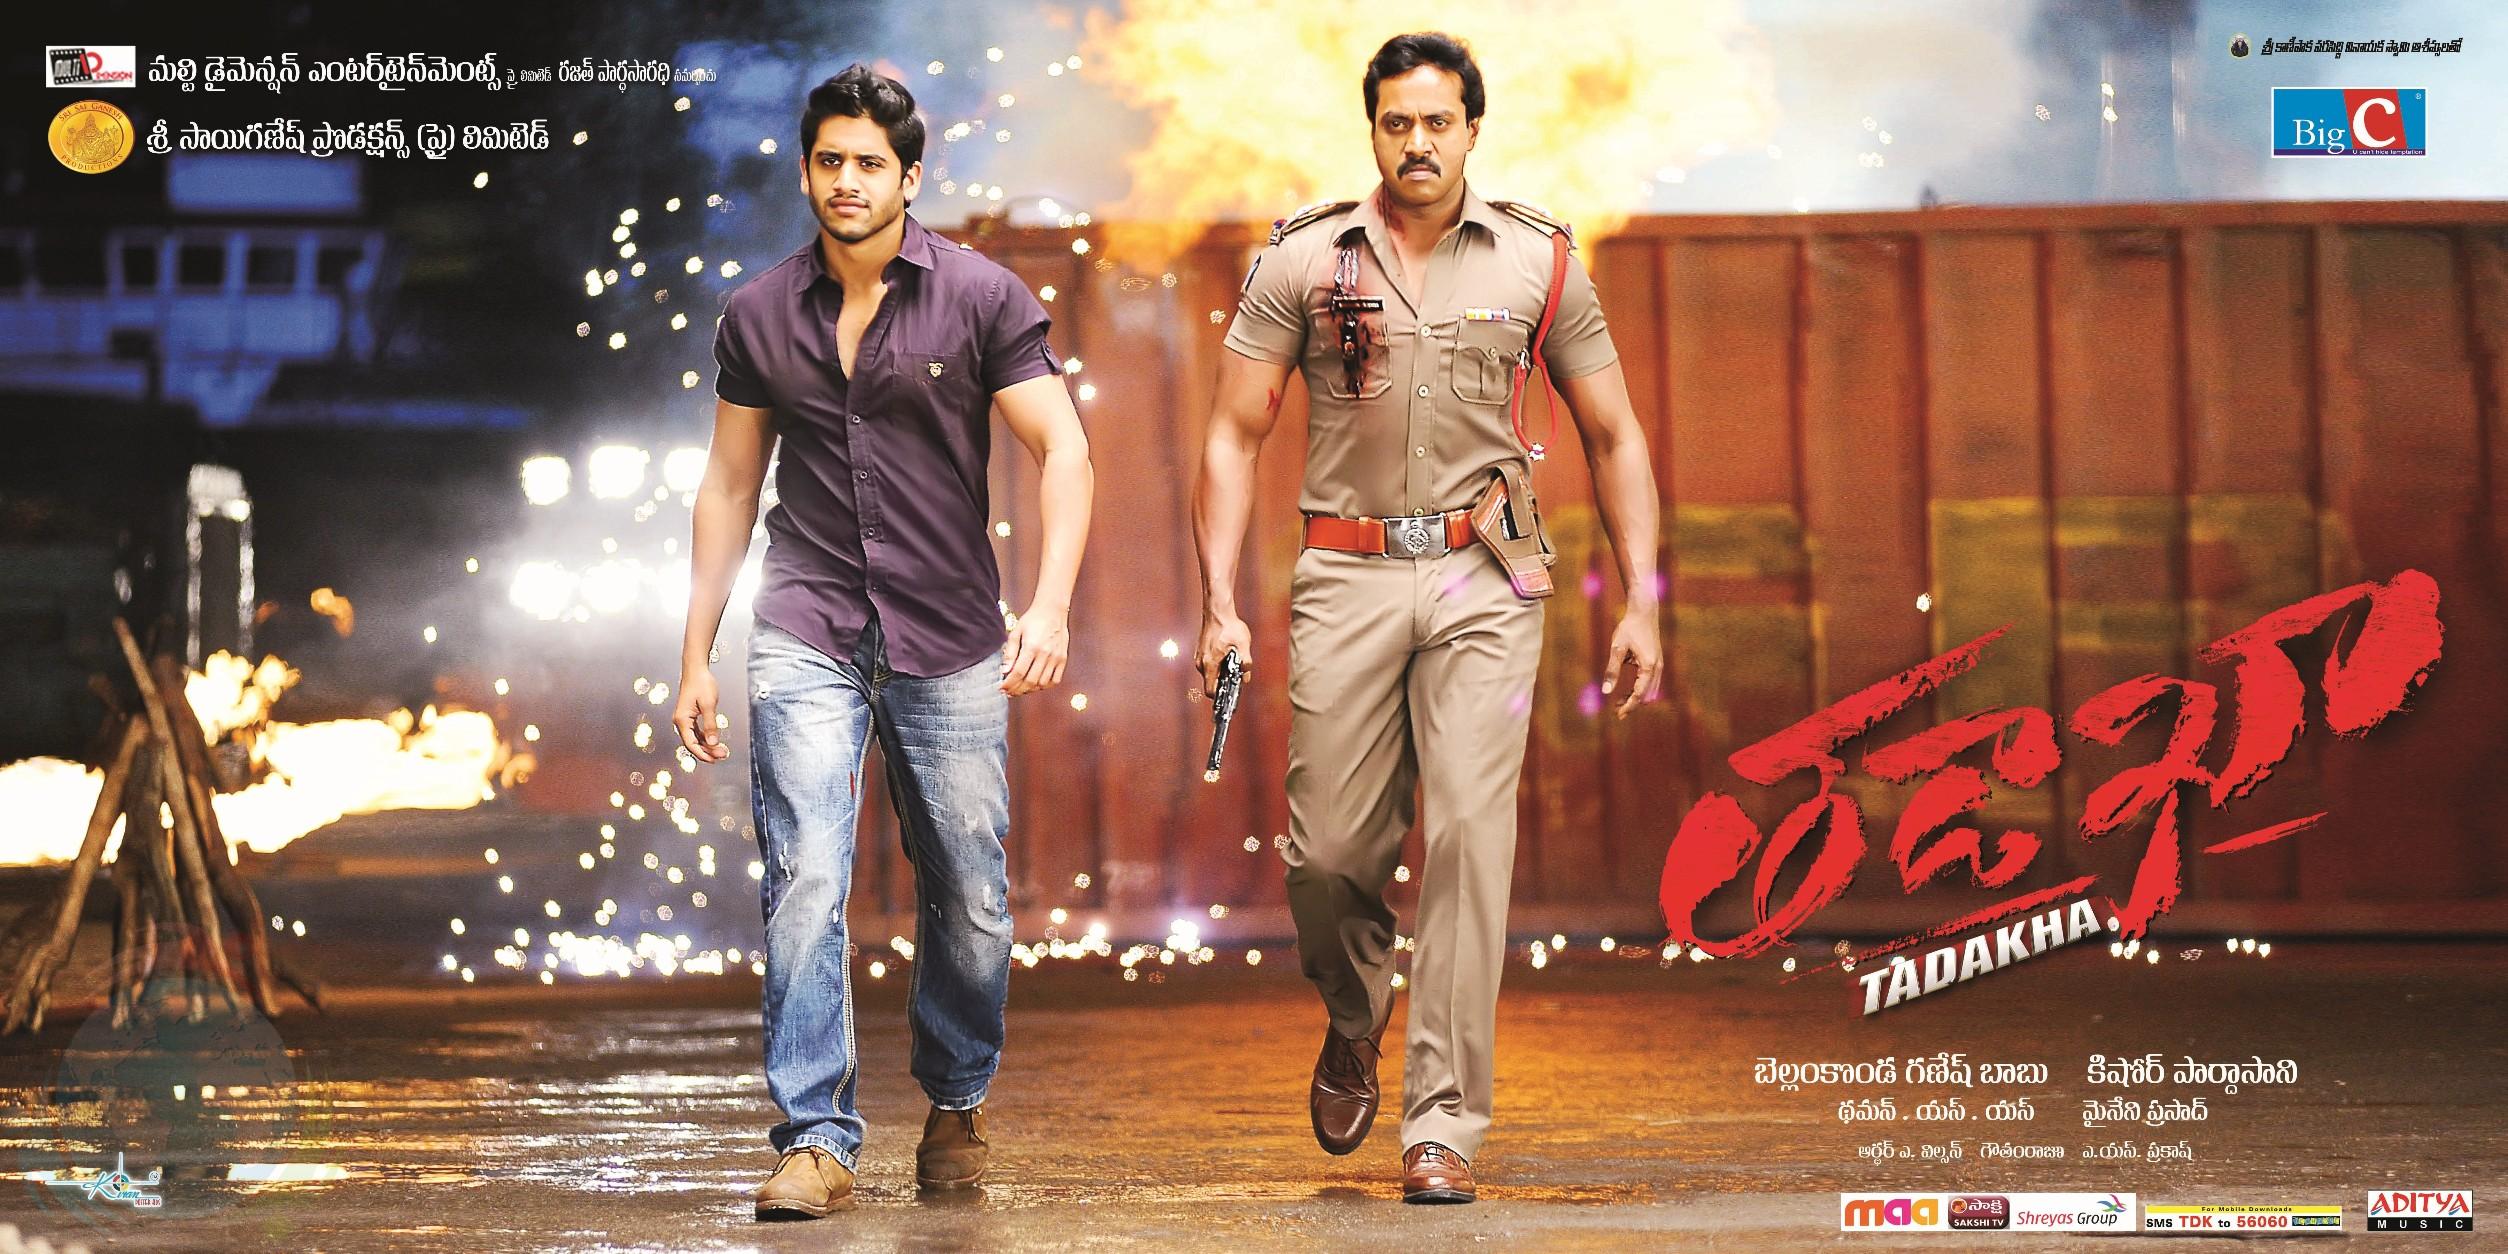 Thadaka 2013 Telugu Movie Watch Online Firstmoviez South Asian